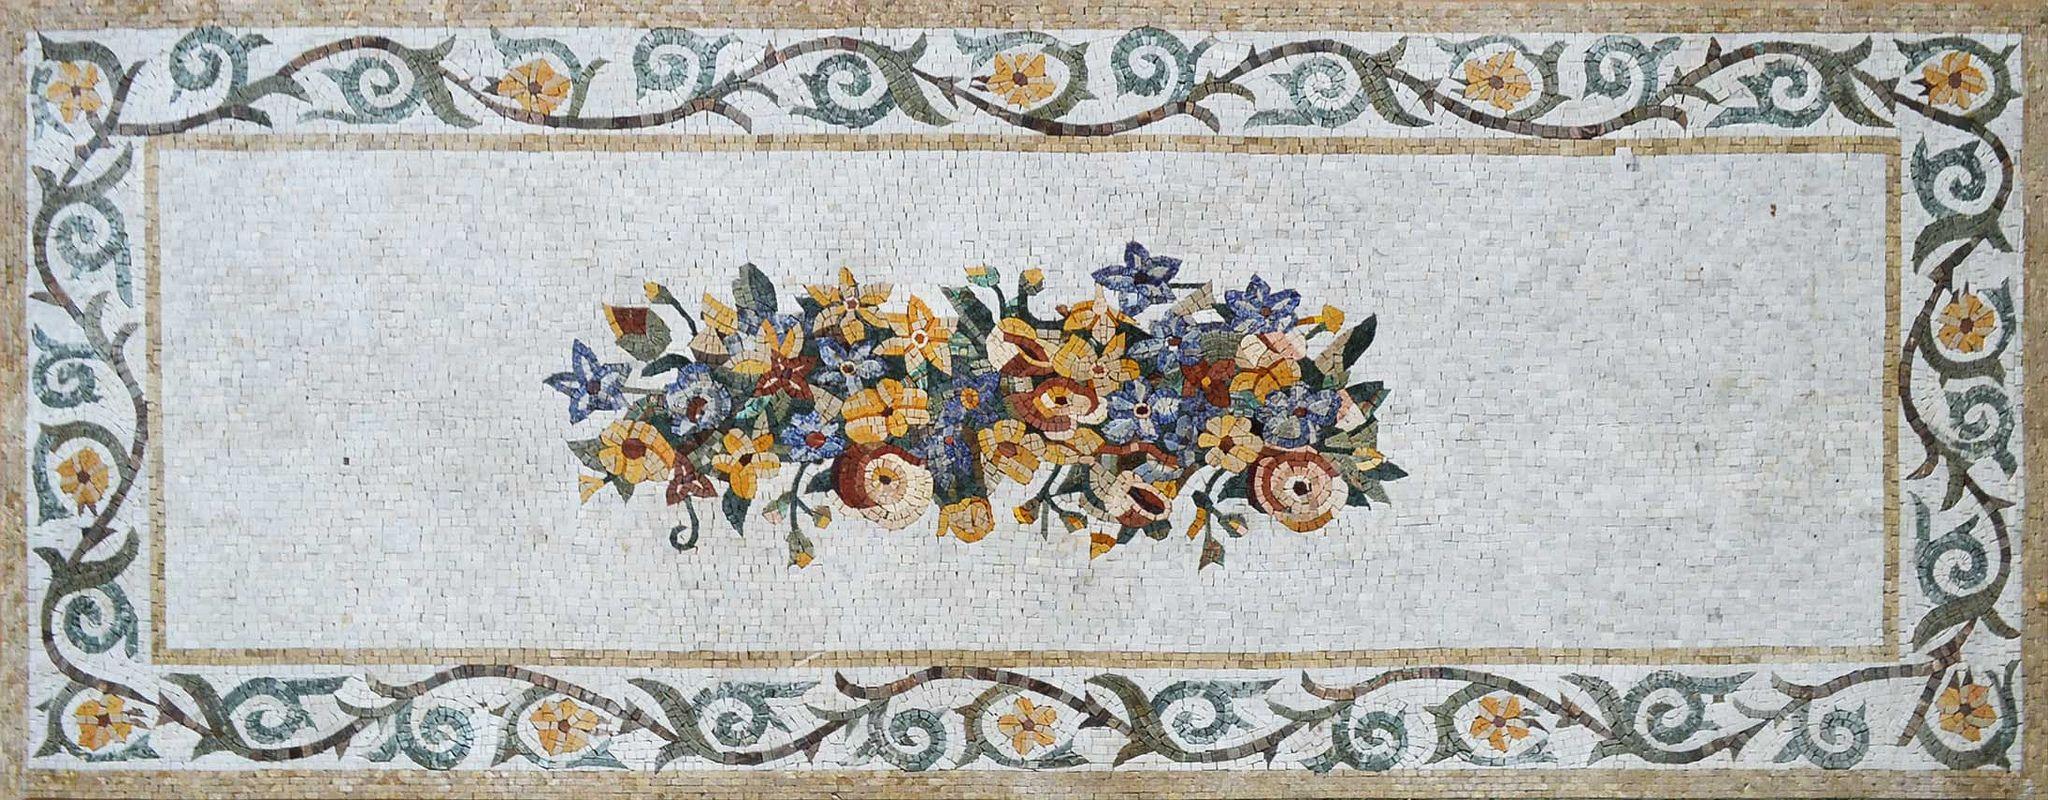 https://flic.kr/p/dbTi75 | Floral Mosaic Rug -